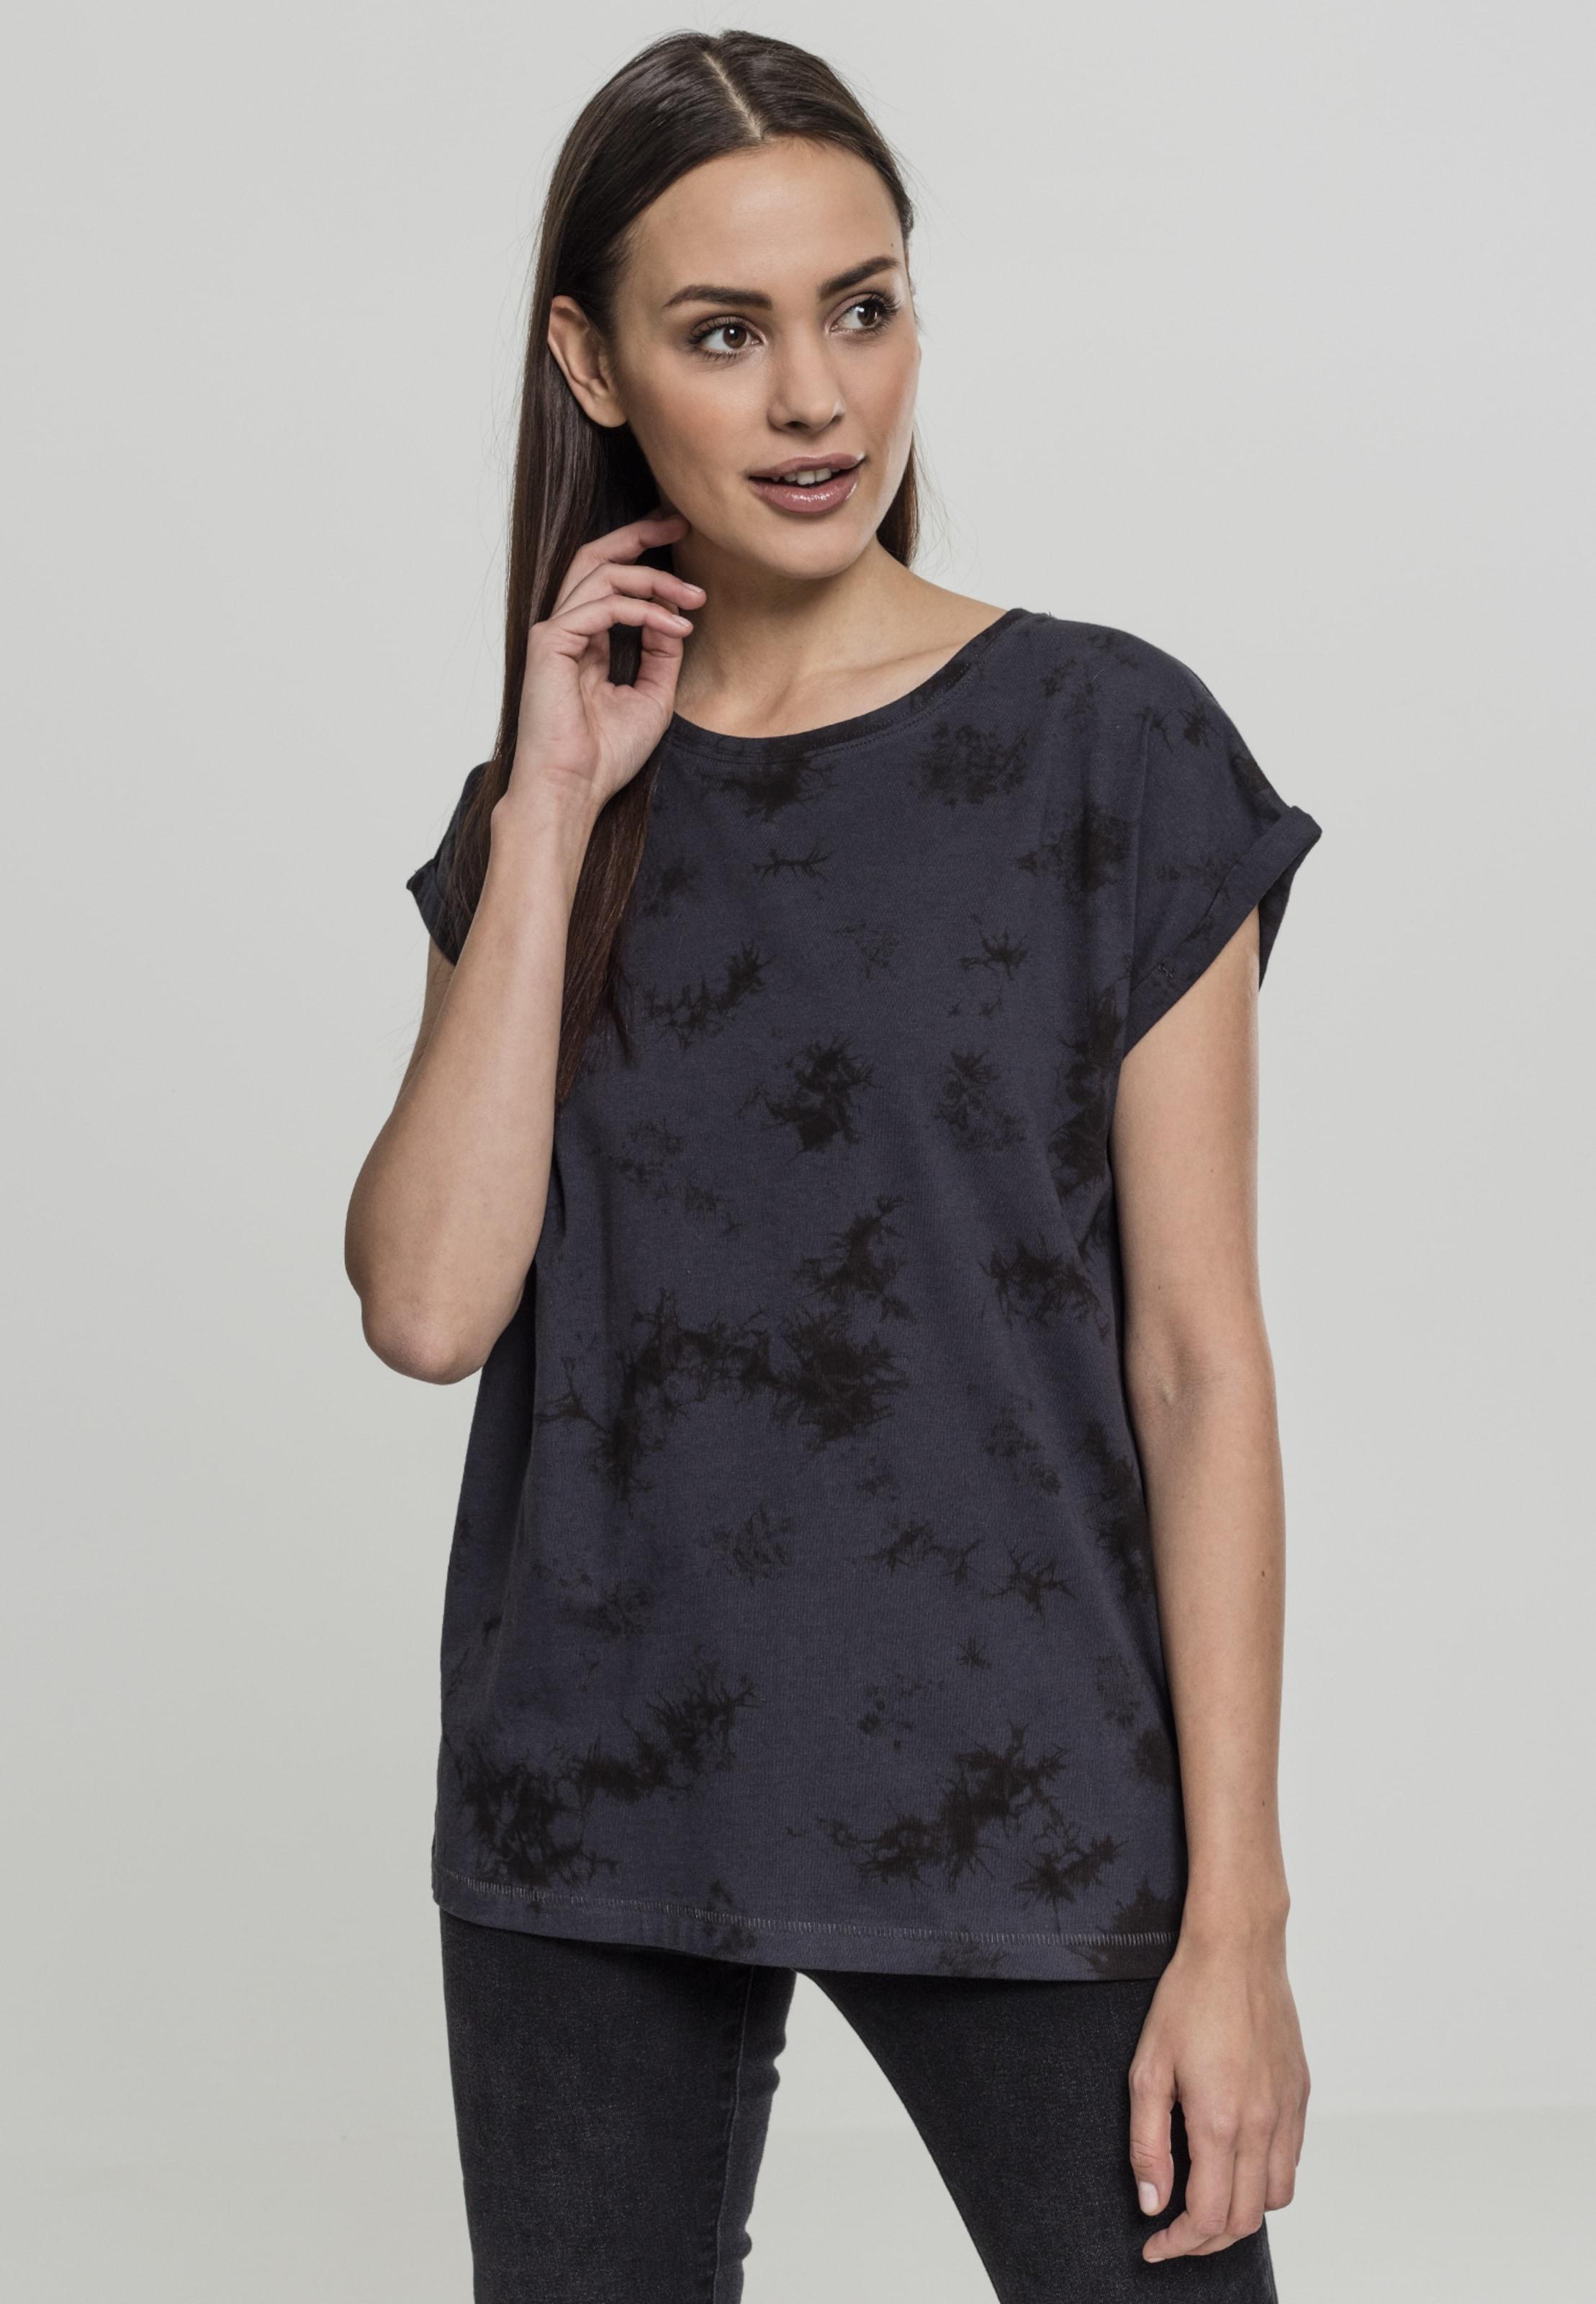 Shoulder In Classics Tee' NachtblauSchwarz Urban 'ladies Shirt Batic Extended kXN8nw0OP